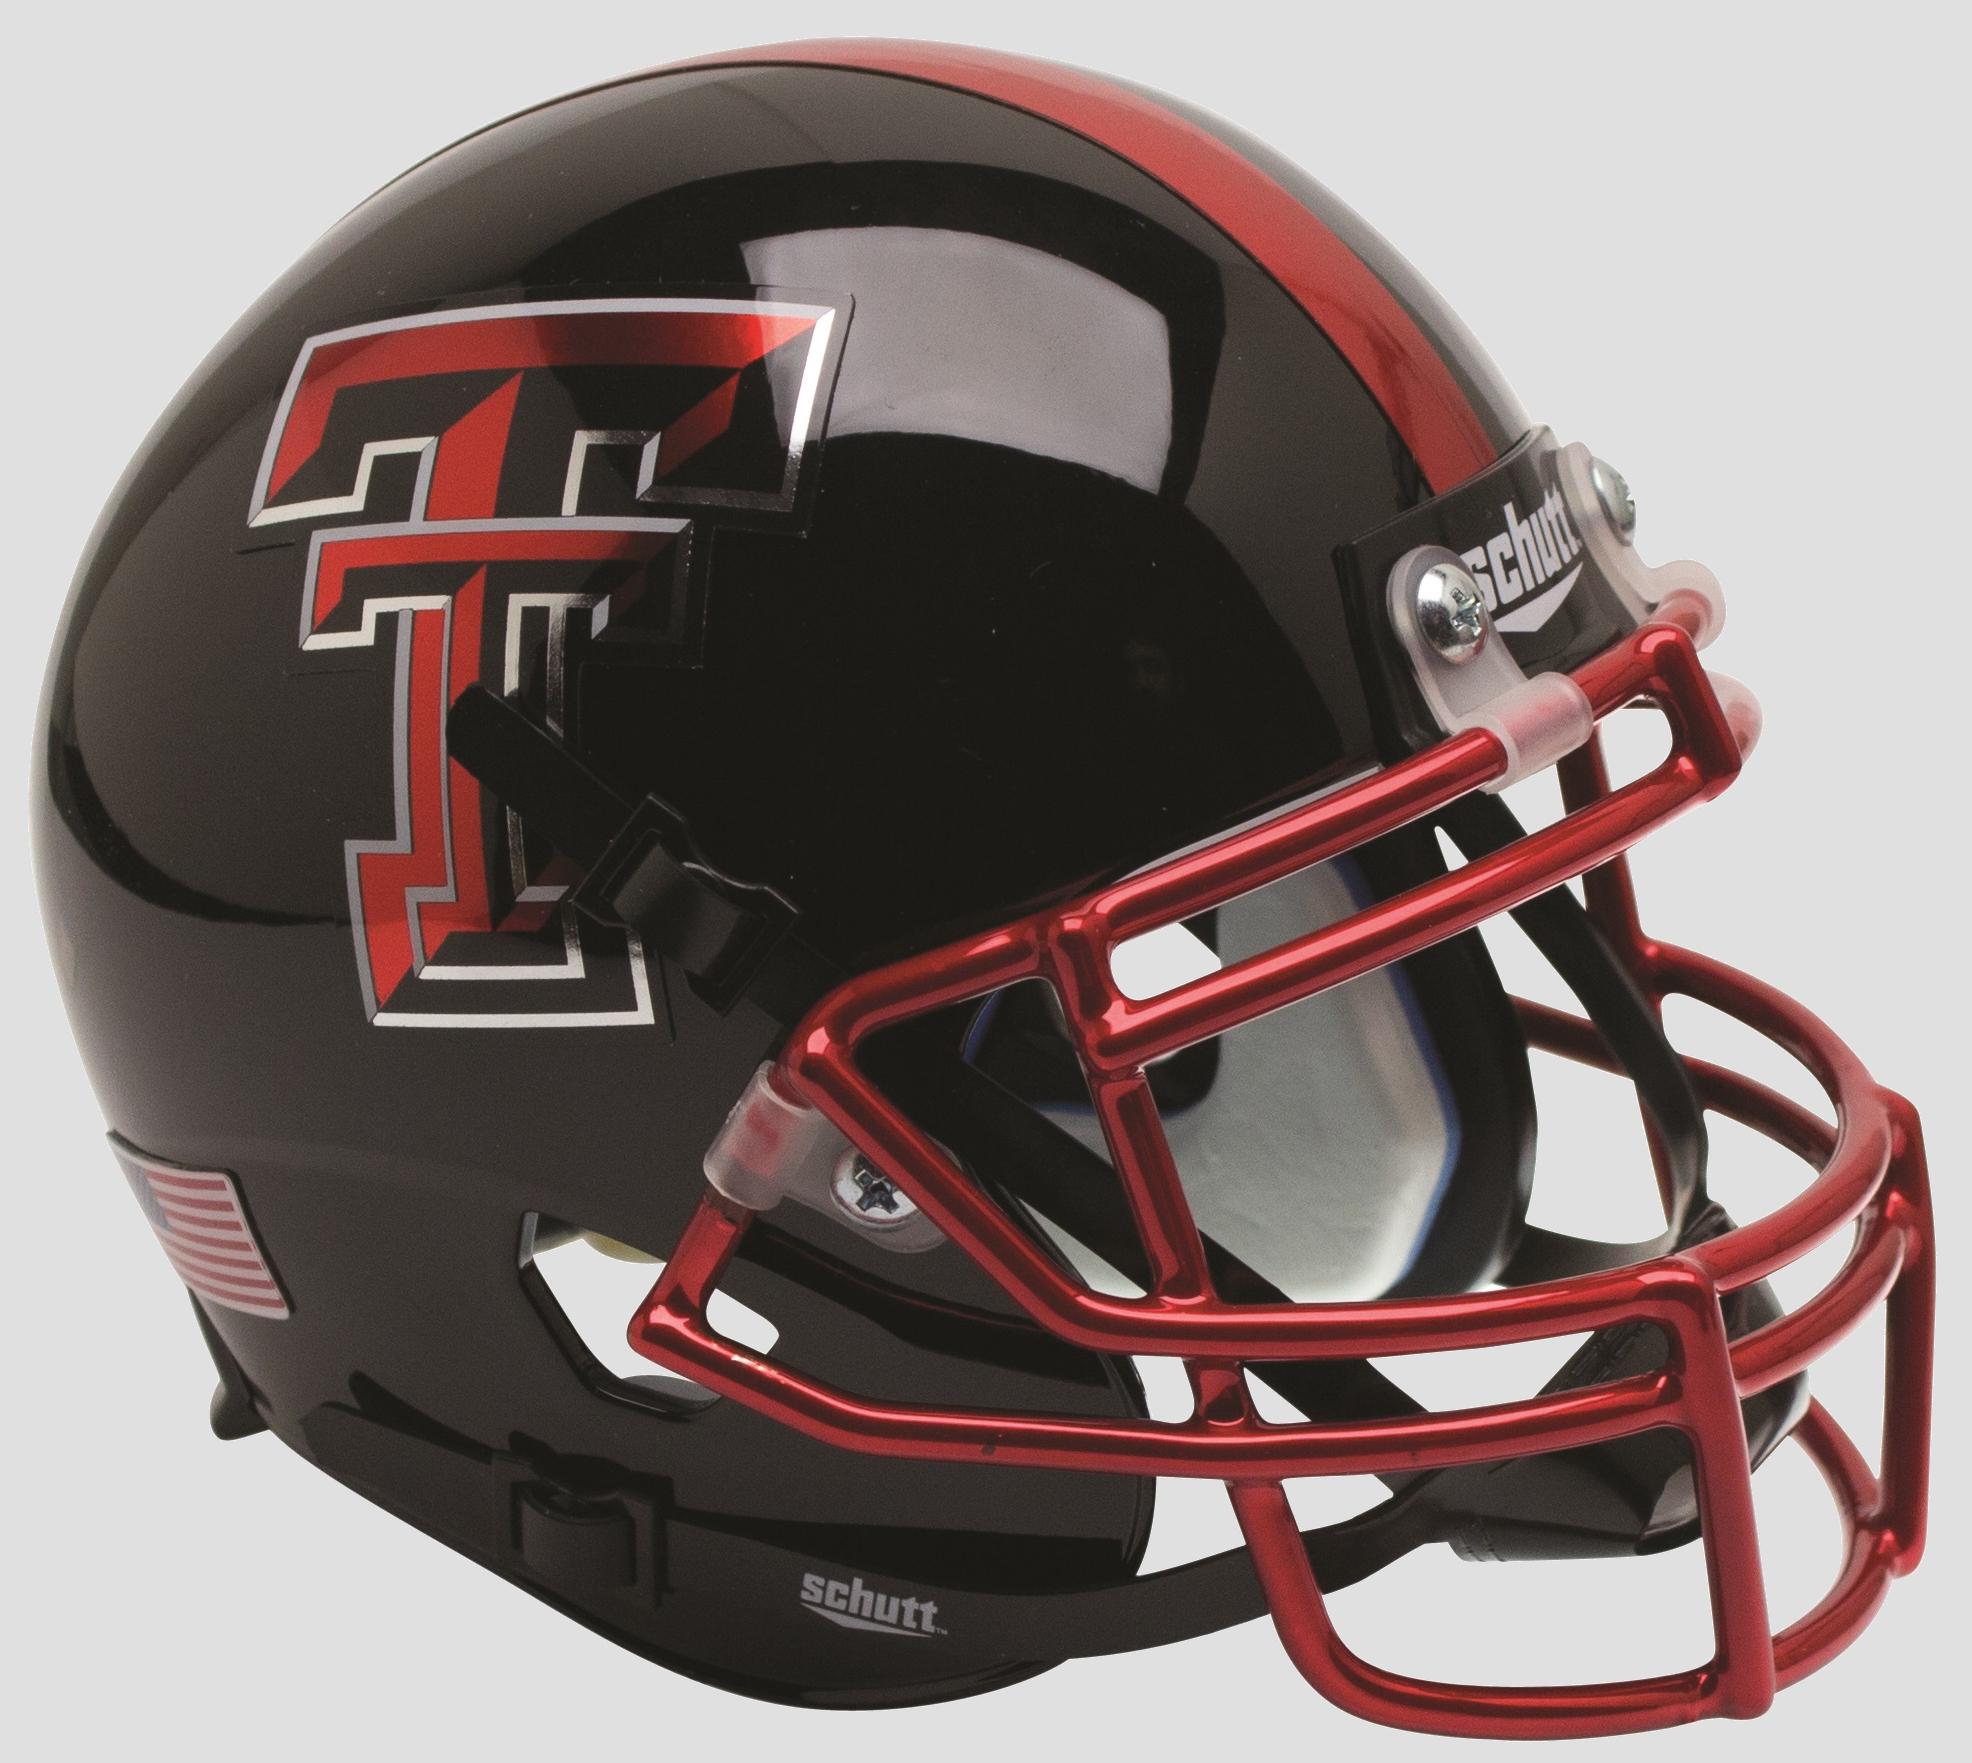 Texas Tech Red Raiders Mini XP Authentic Helmet Schutt <B>Chrome Mask Guns Up</B>